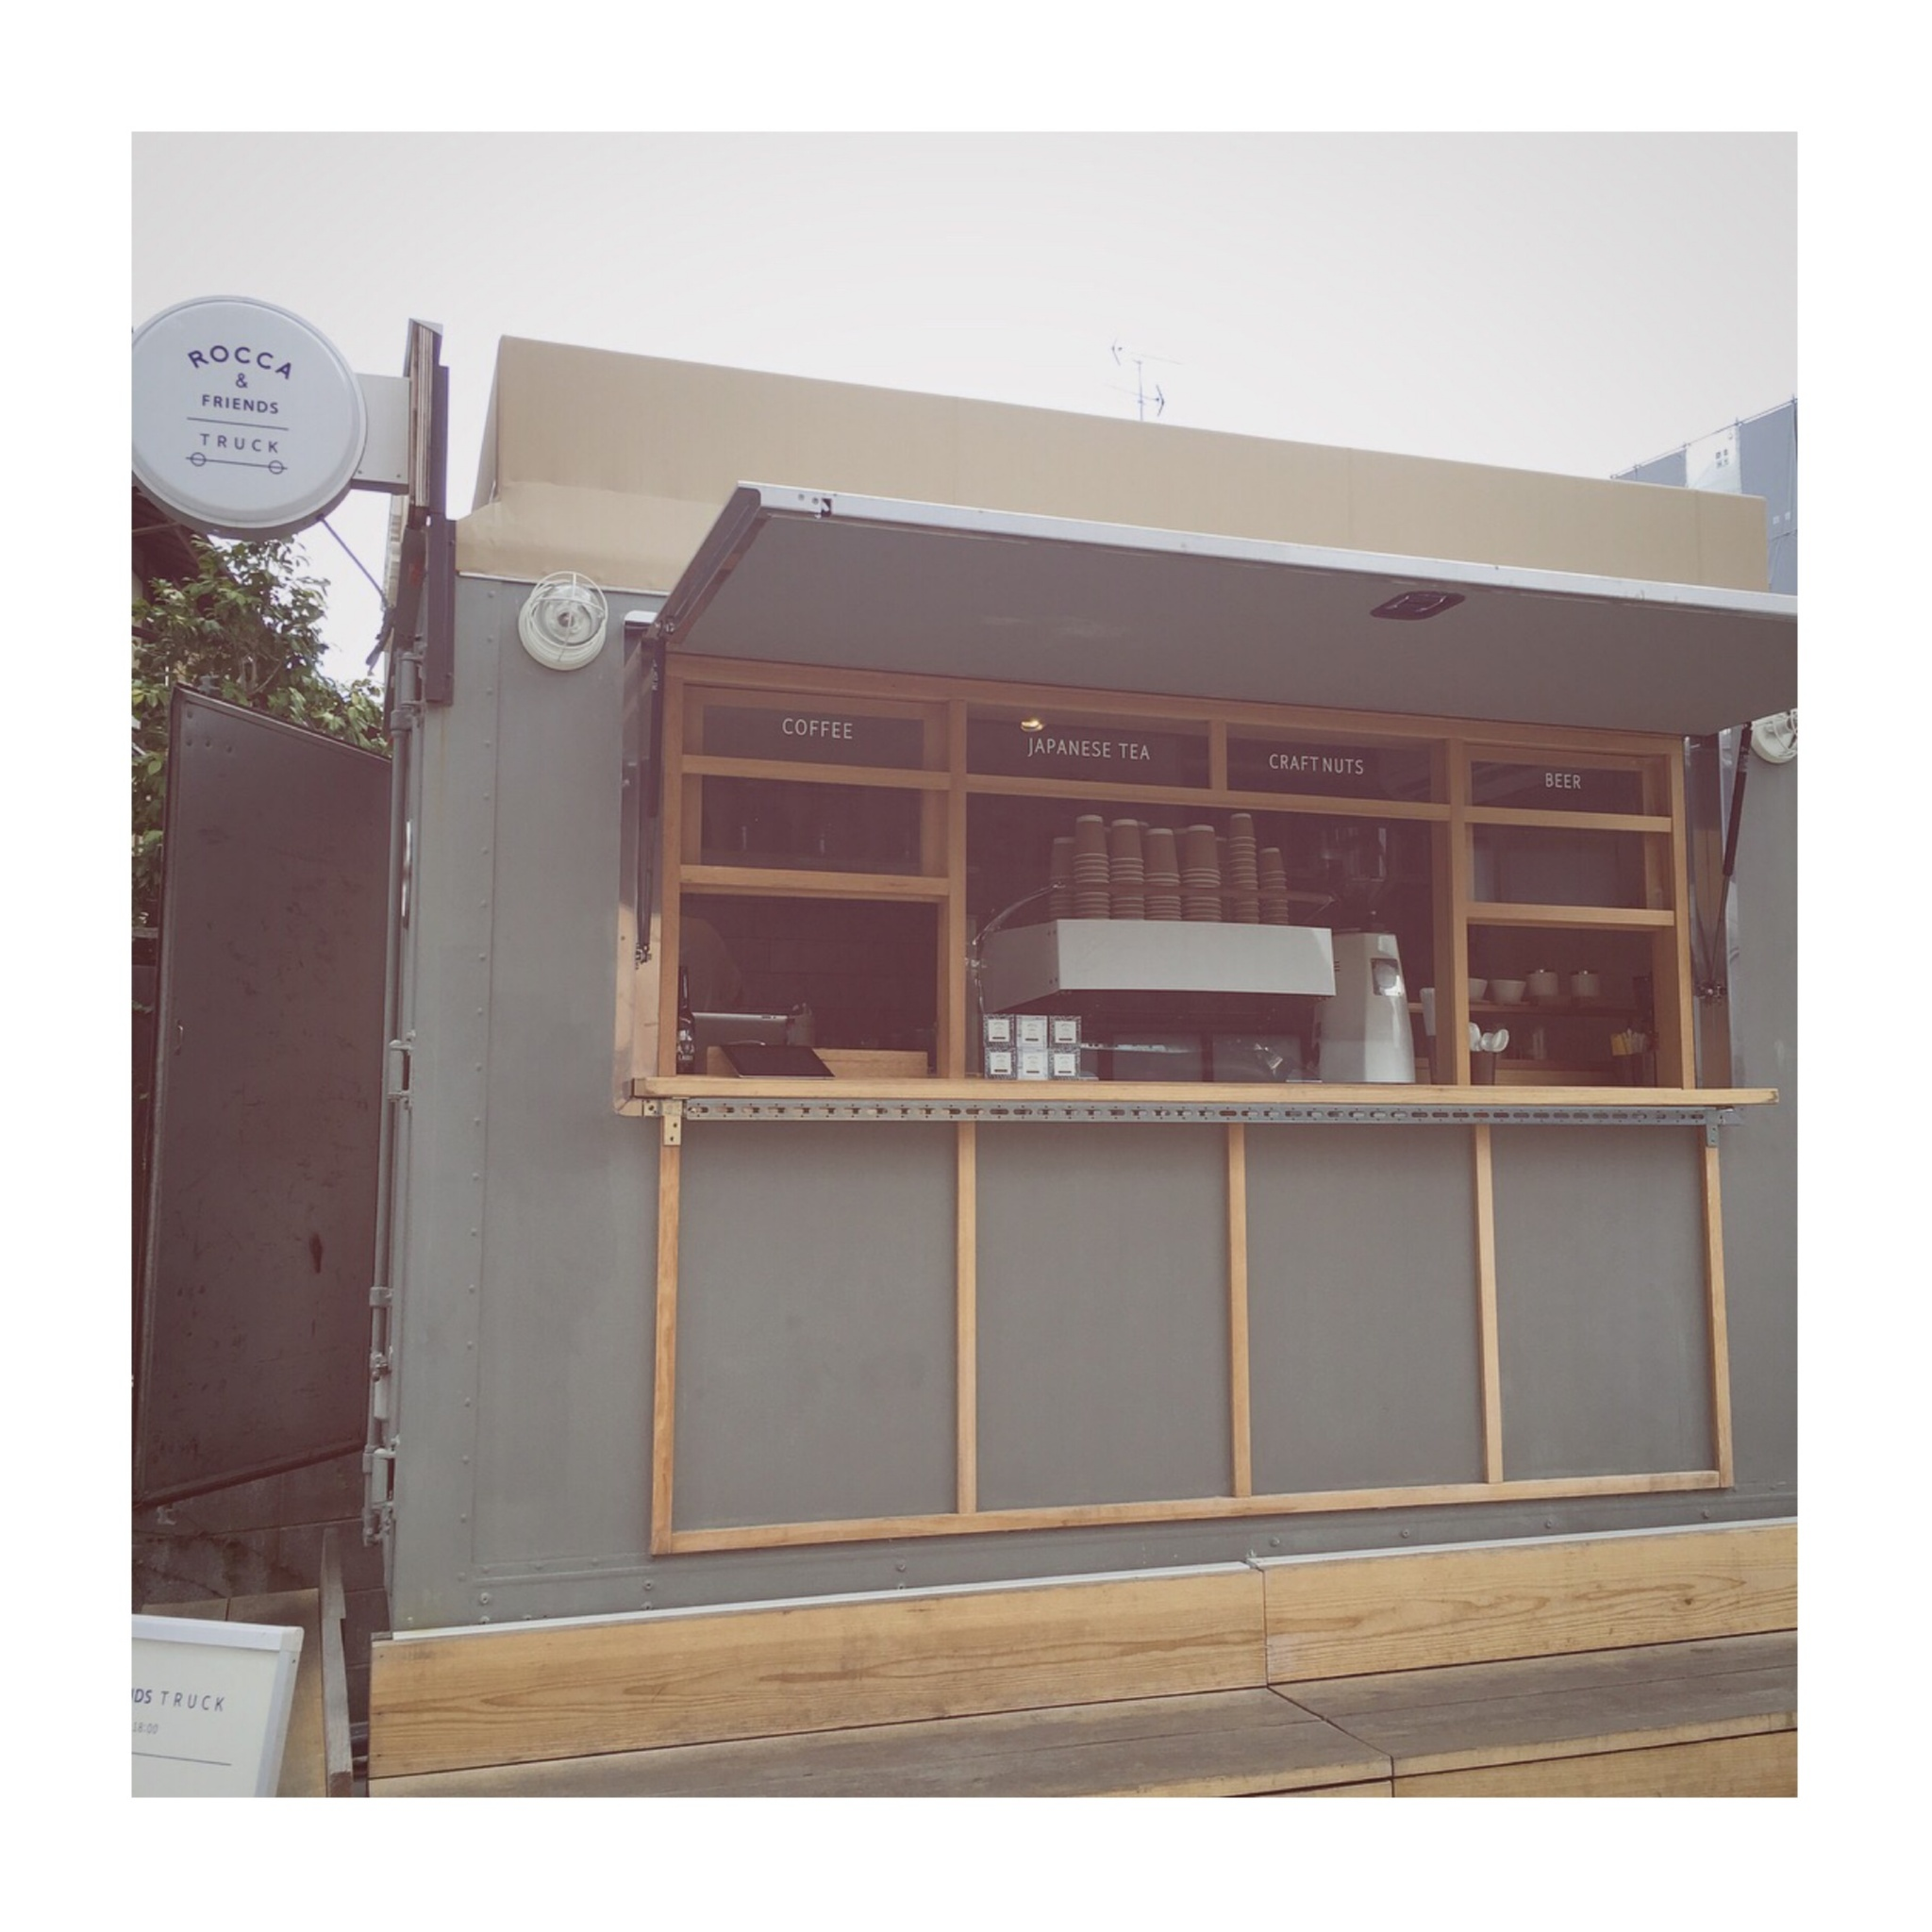 #5【#cafestagram】❤️:《京都》に行ったら絶対飲みたい!ROCCA&FRIENDS TRUCKの抹茶ラテがかわいすぎる◡̈_6